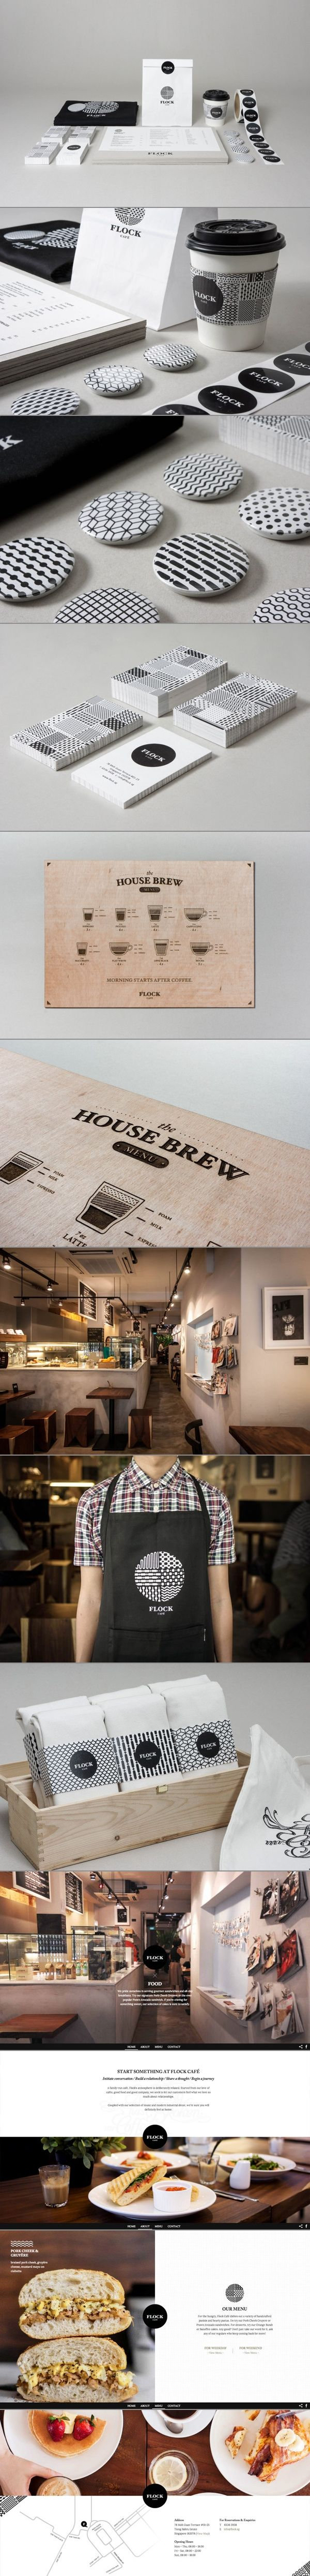 Flock Café by Kilo Studio, via Behance. Time to eat #identity #packaging #branding PD